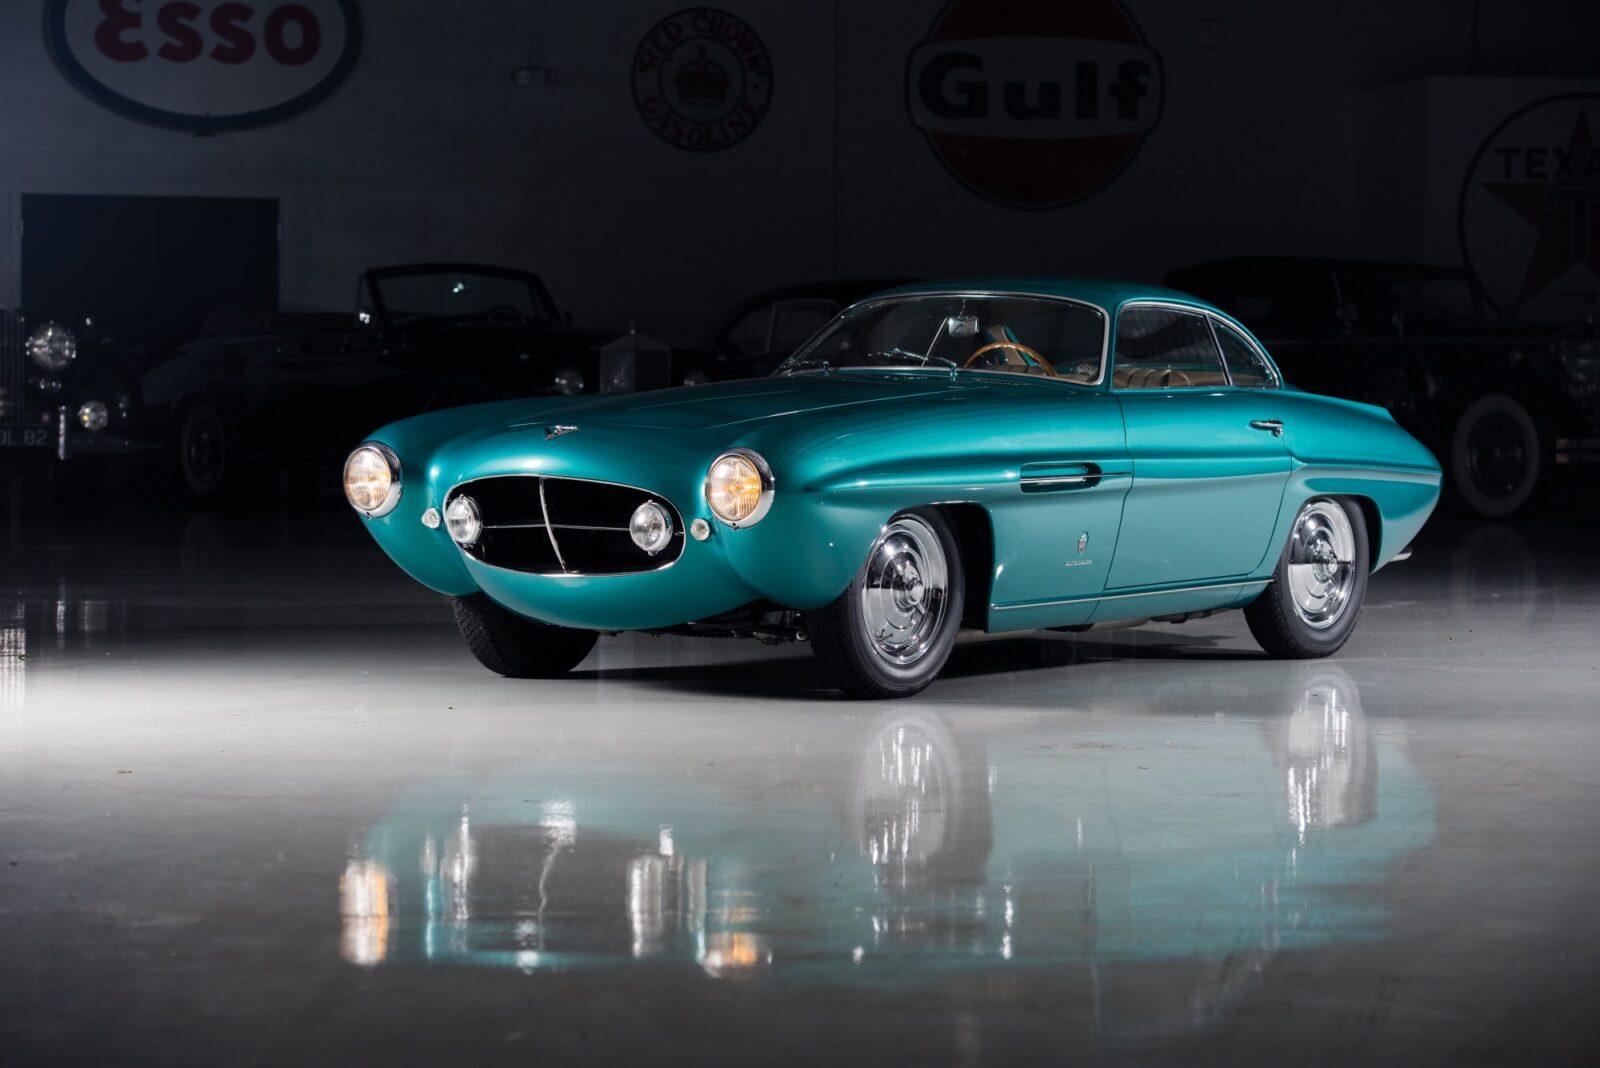 fiat 8v ghia supersonic 1 1600x1068 - 1953 Fiat 8V Ghia Supersonic